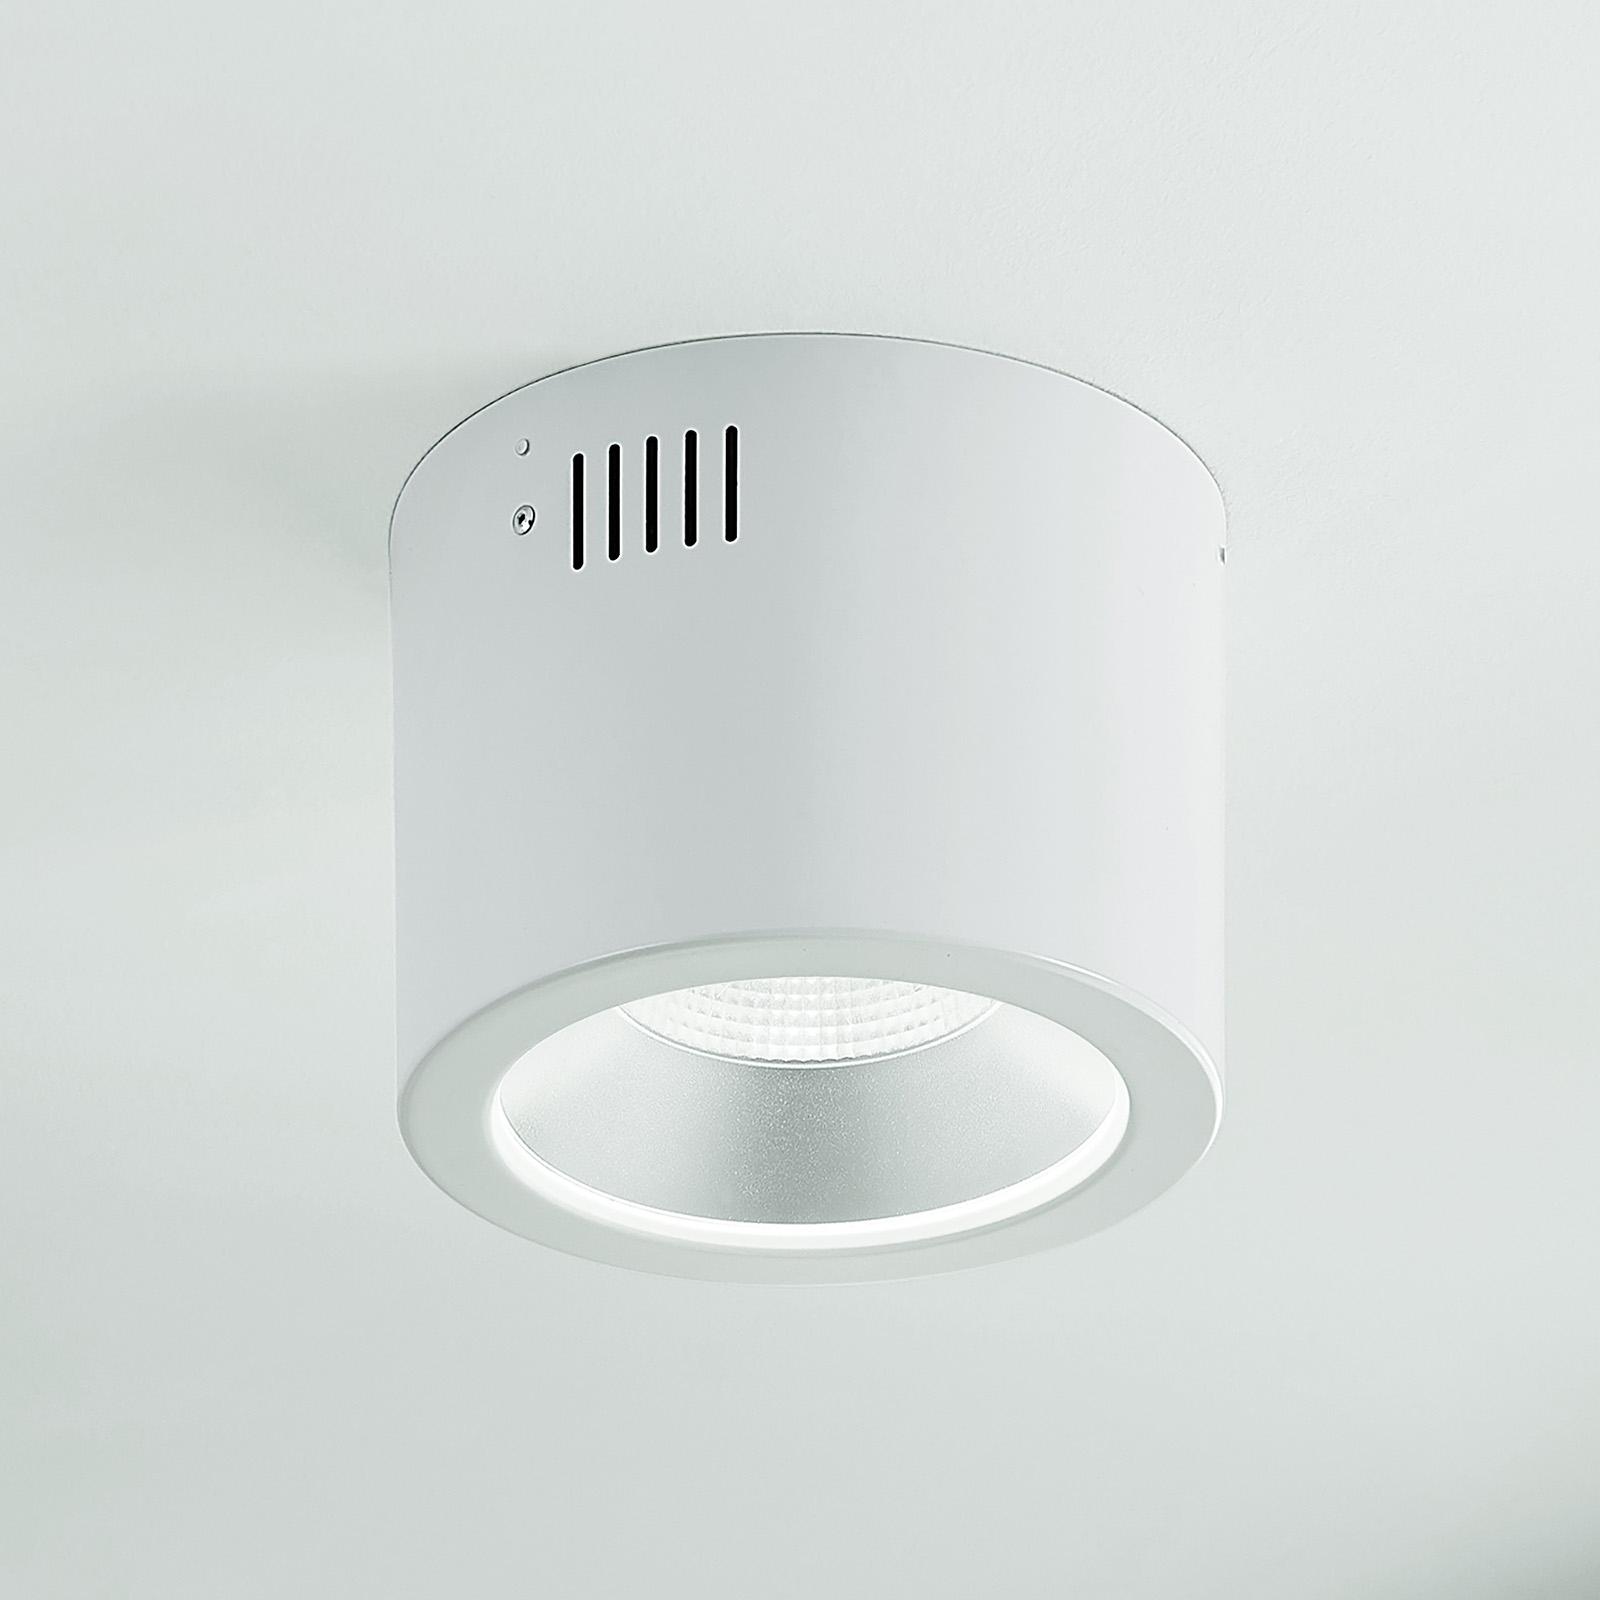 Arcchio Liddy -LED-alasvalo, valkoinen, Ø 17,7 cm